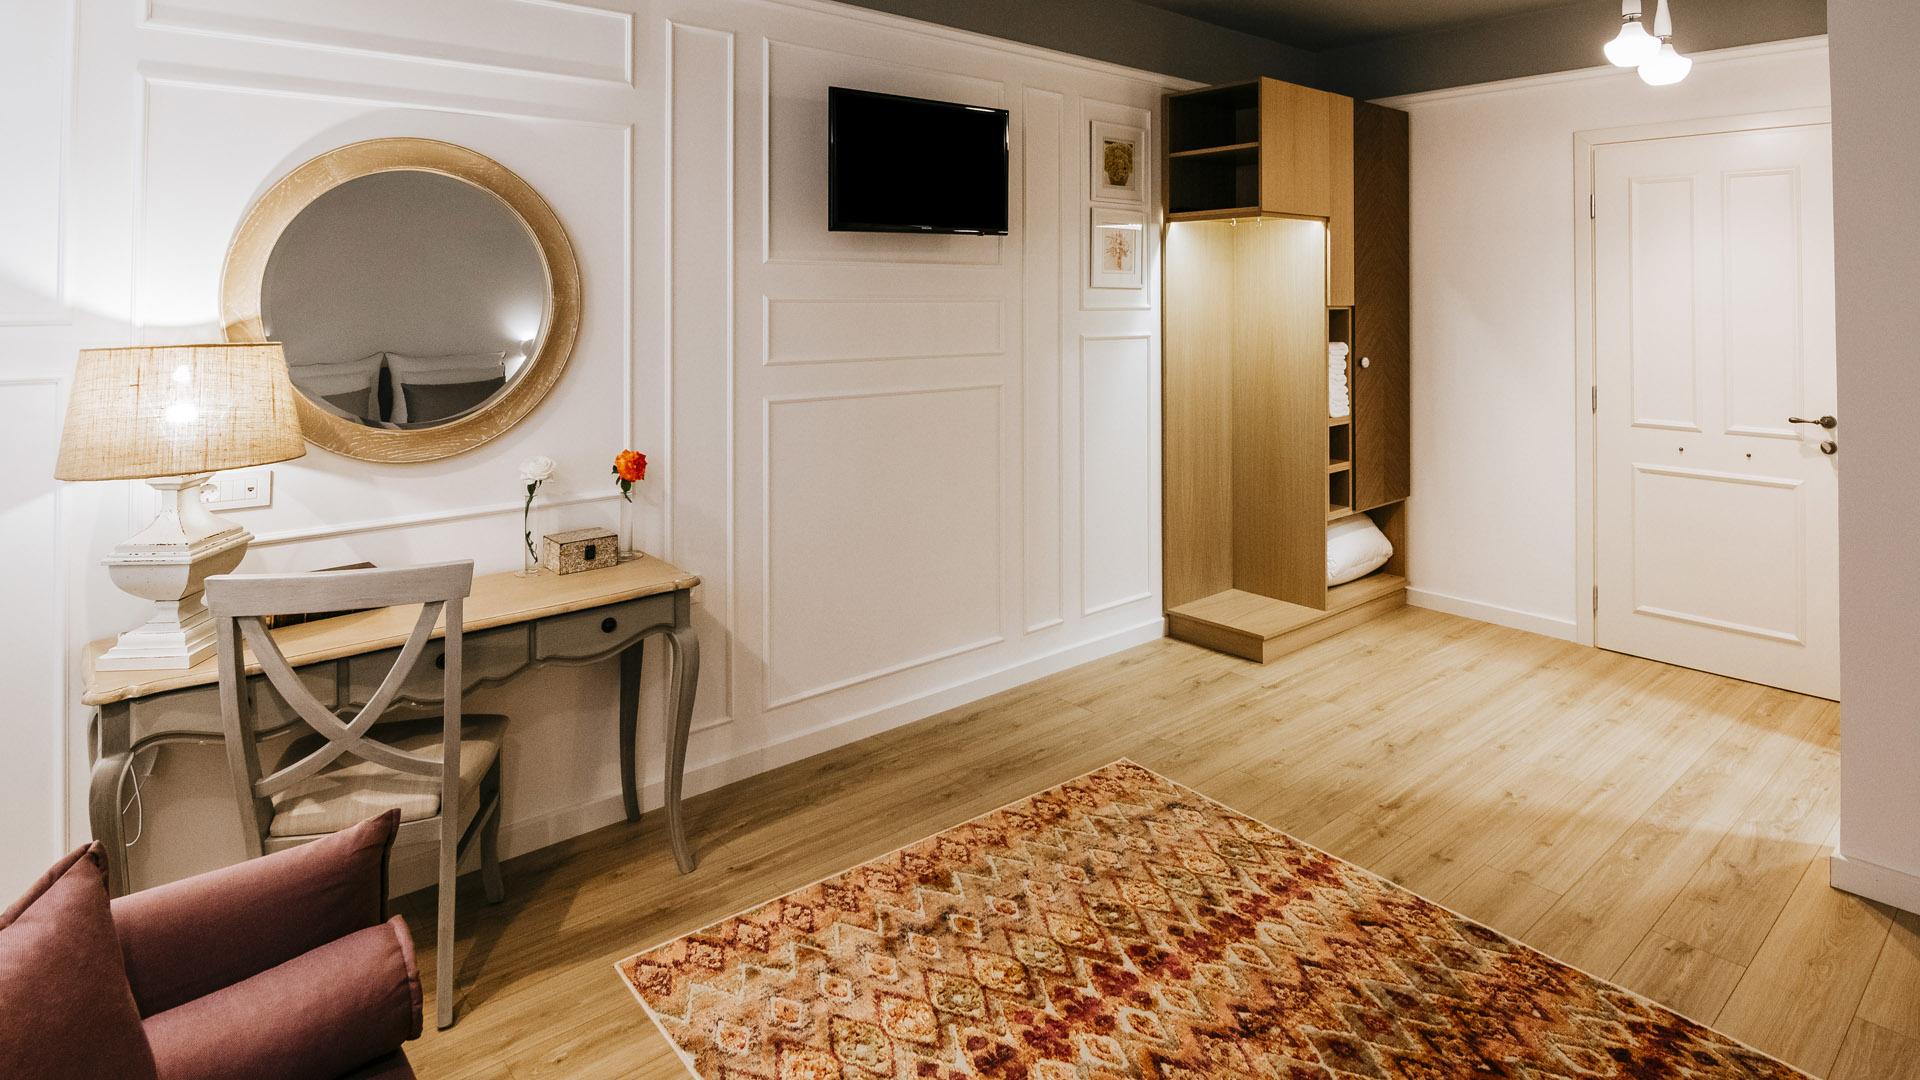 http://itskale-hotel.gr/demo/wp-content/uploads/2013/10/DSC_5936-Edit-2-Edit.jpg